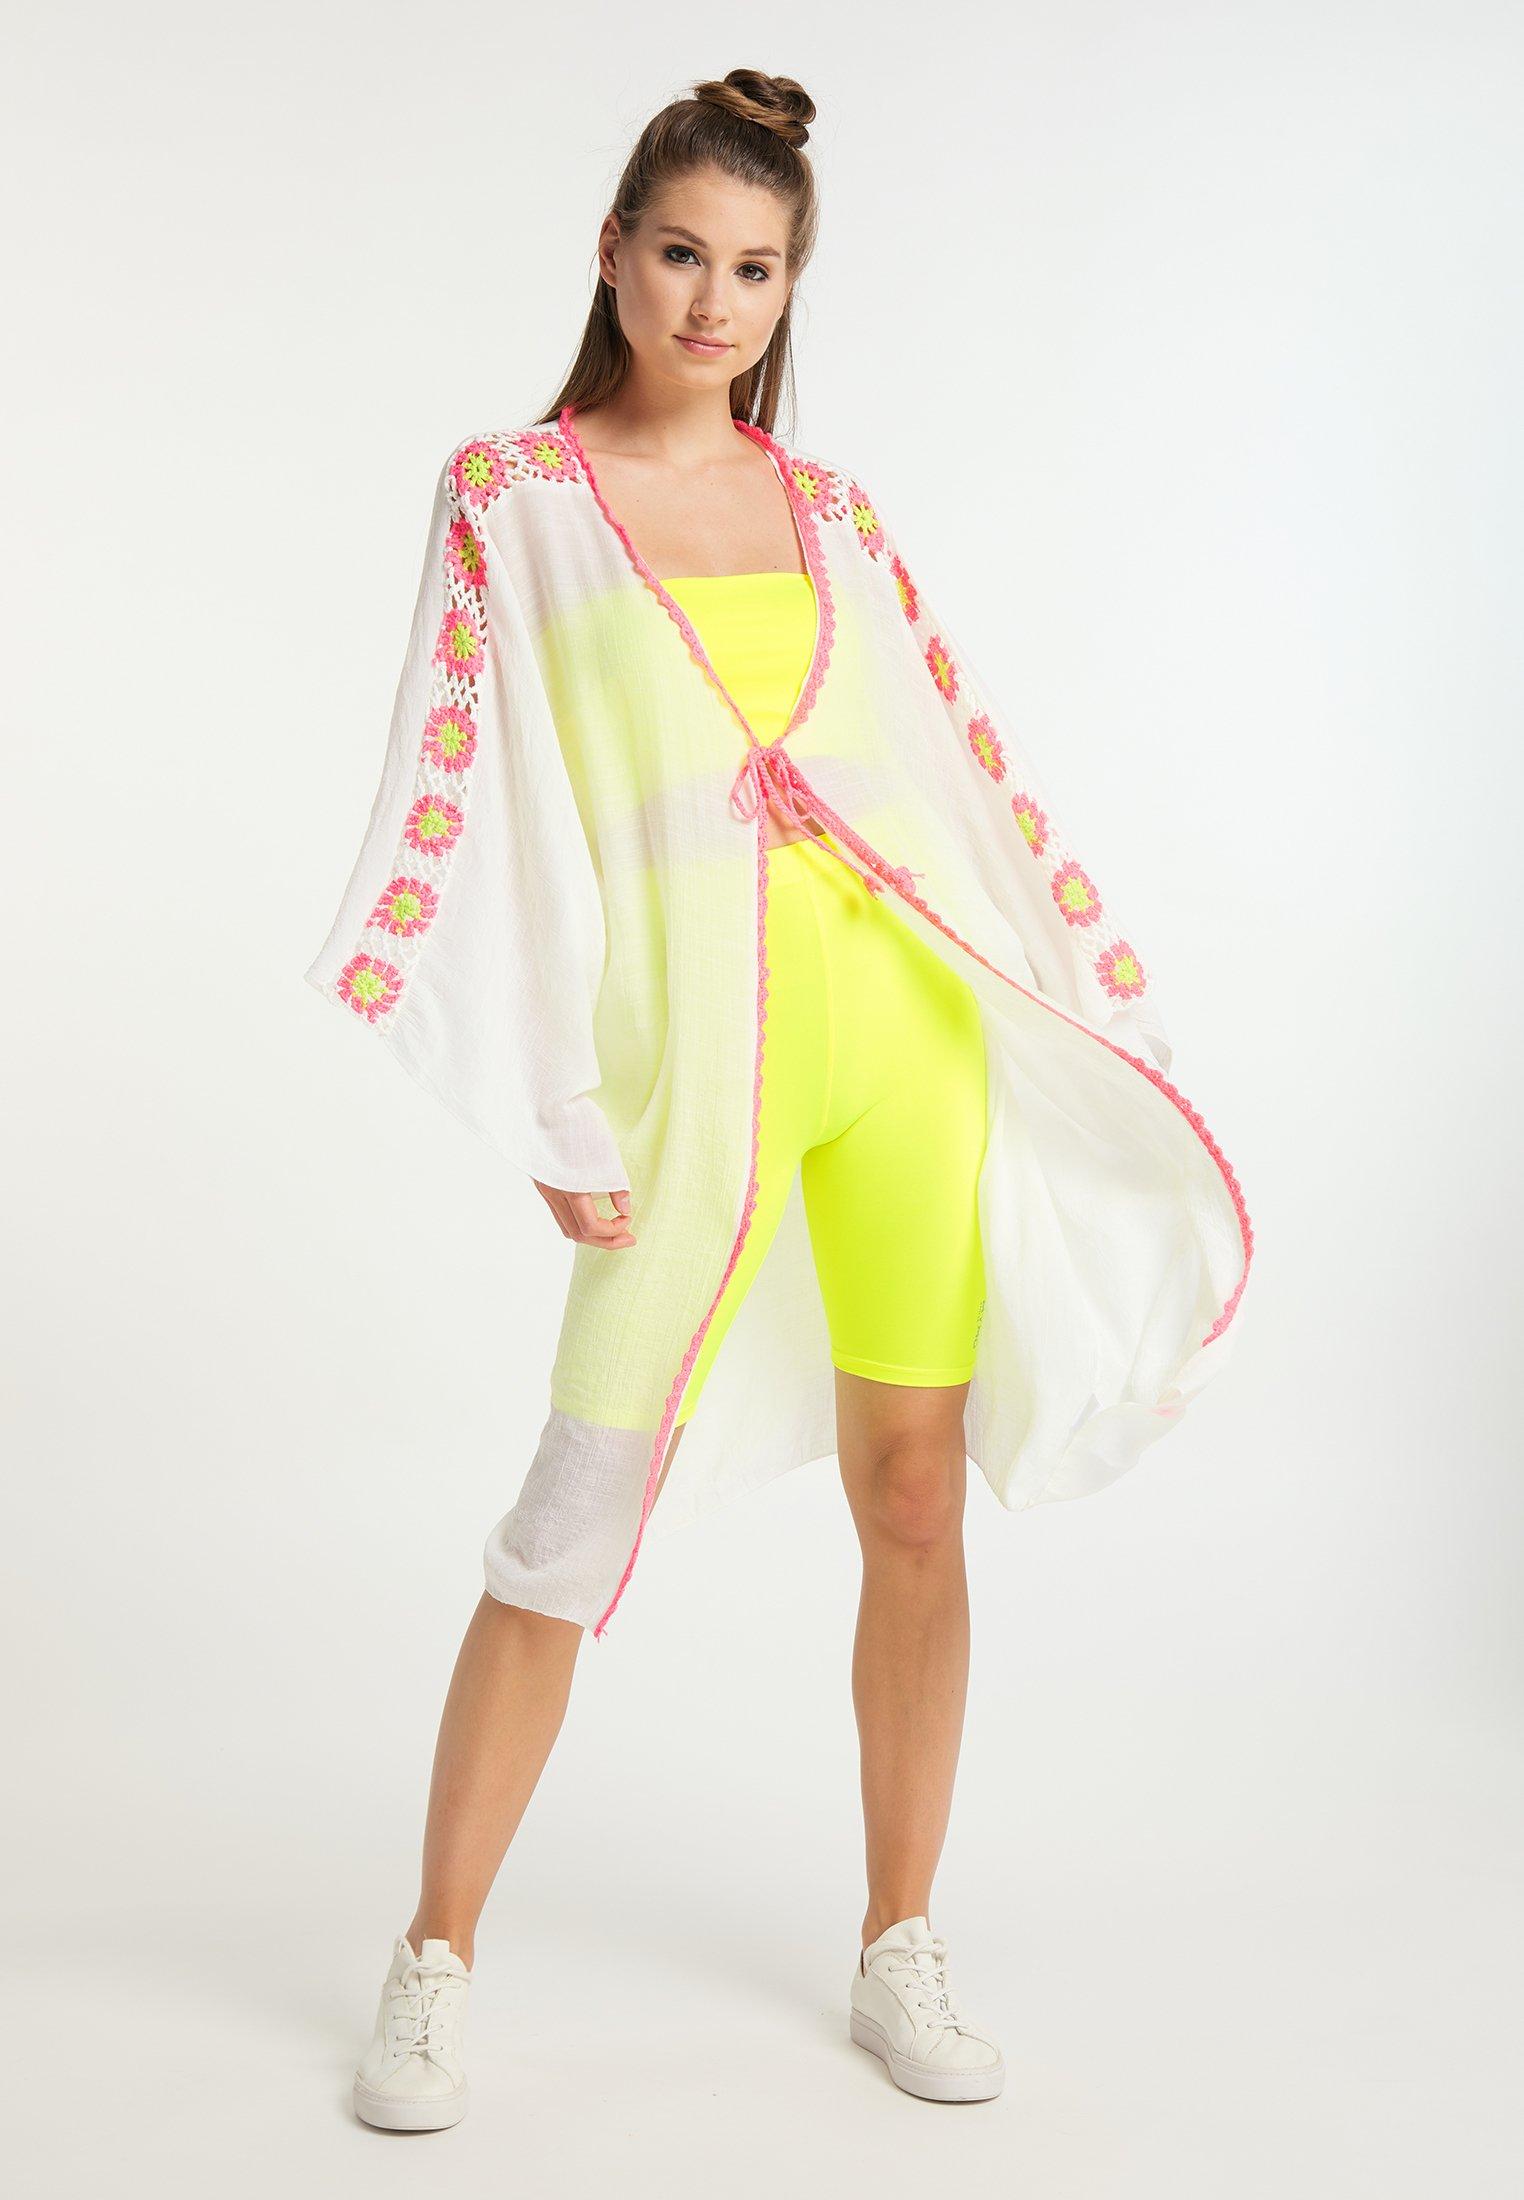 Clearance Women's Clothing myMo Beach accessory wollweiss m1mhB3NTE